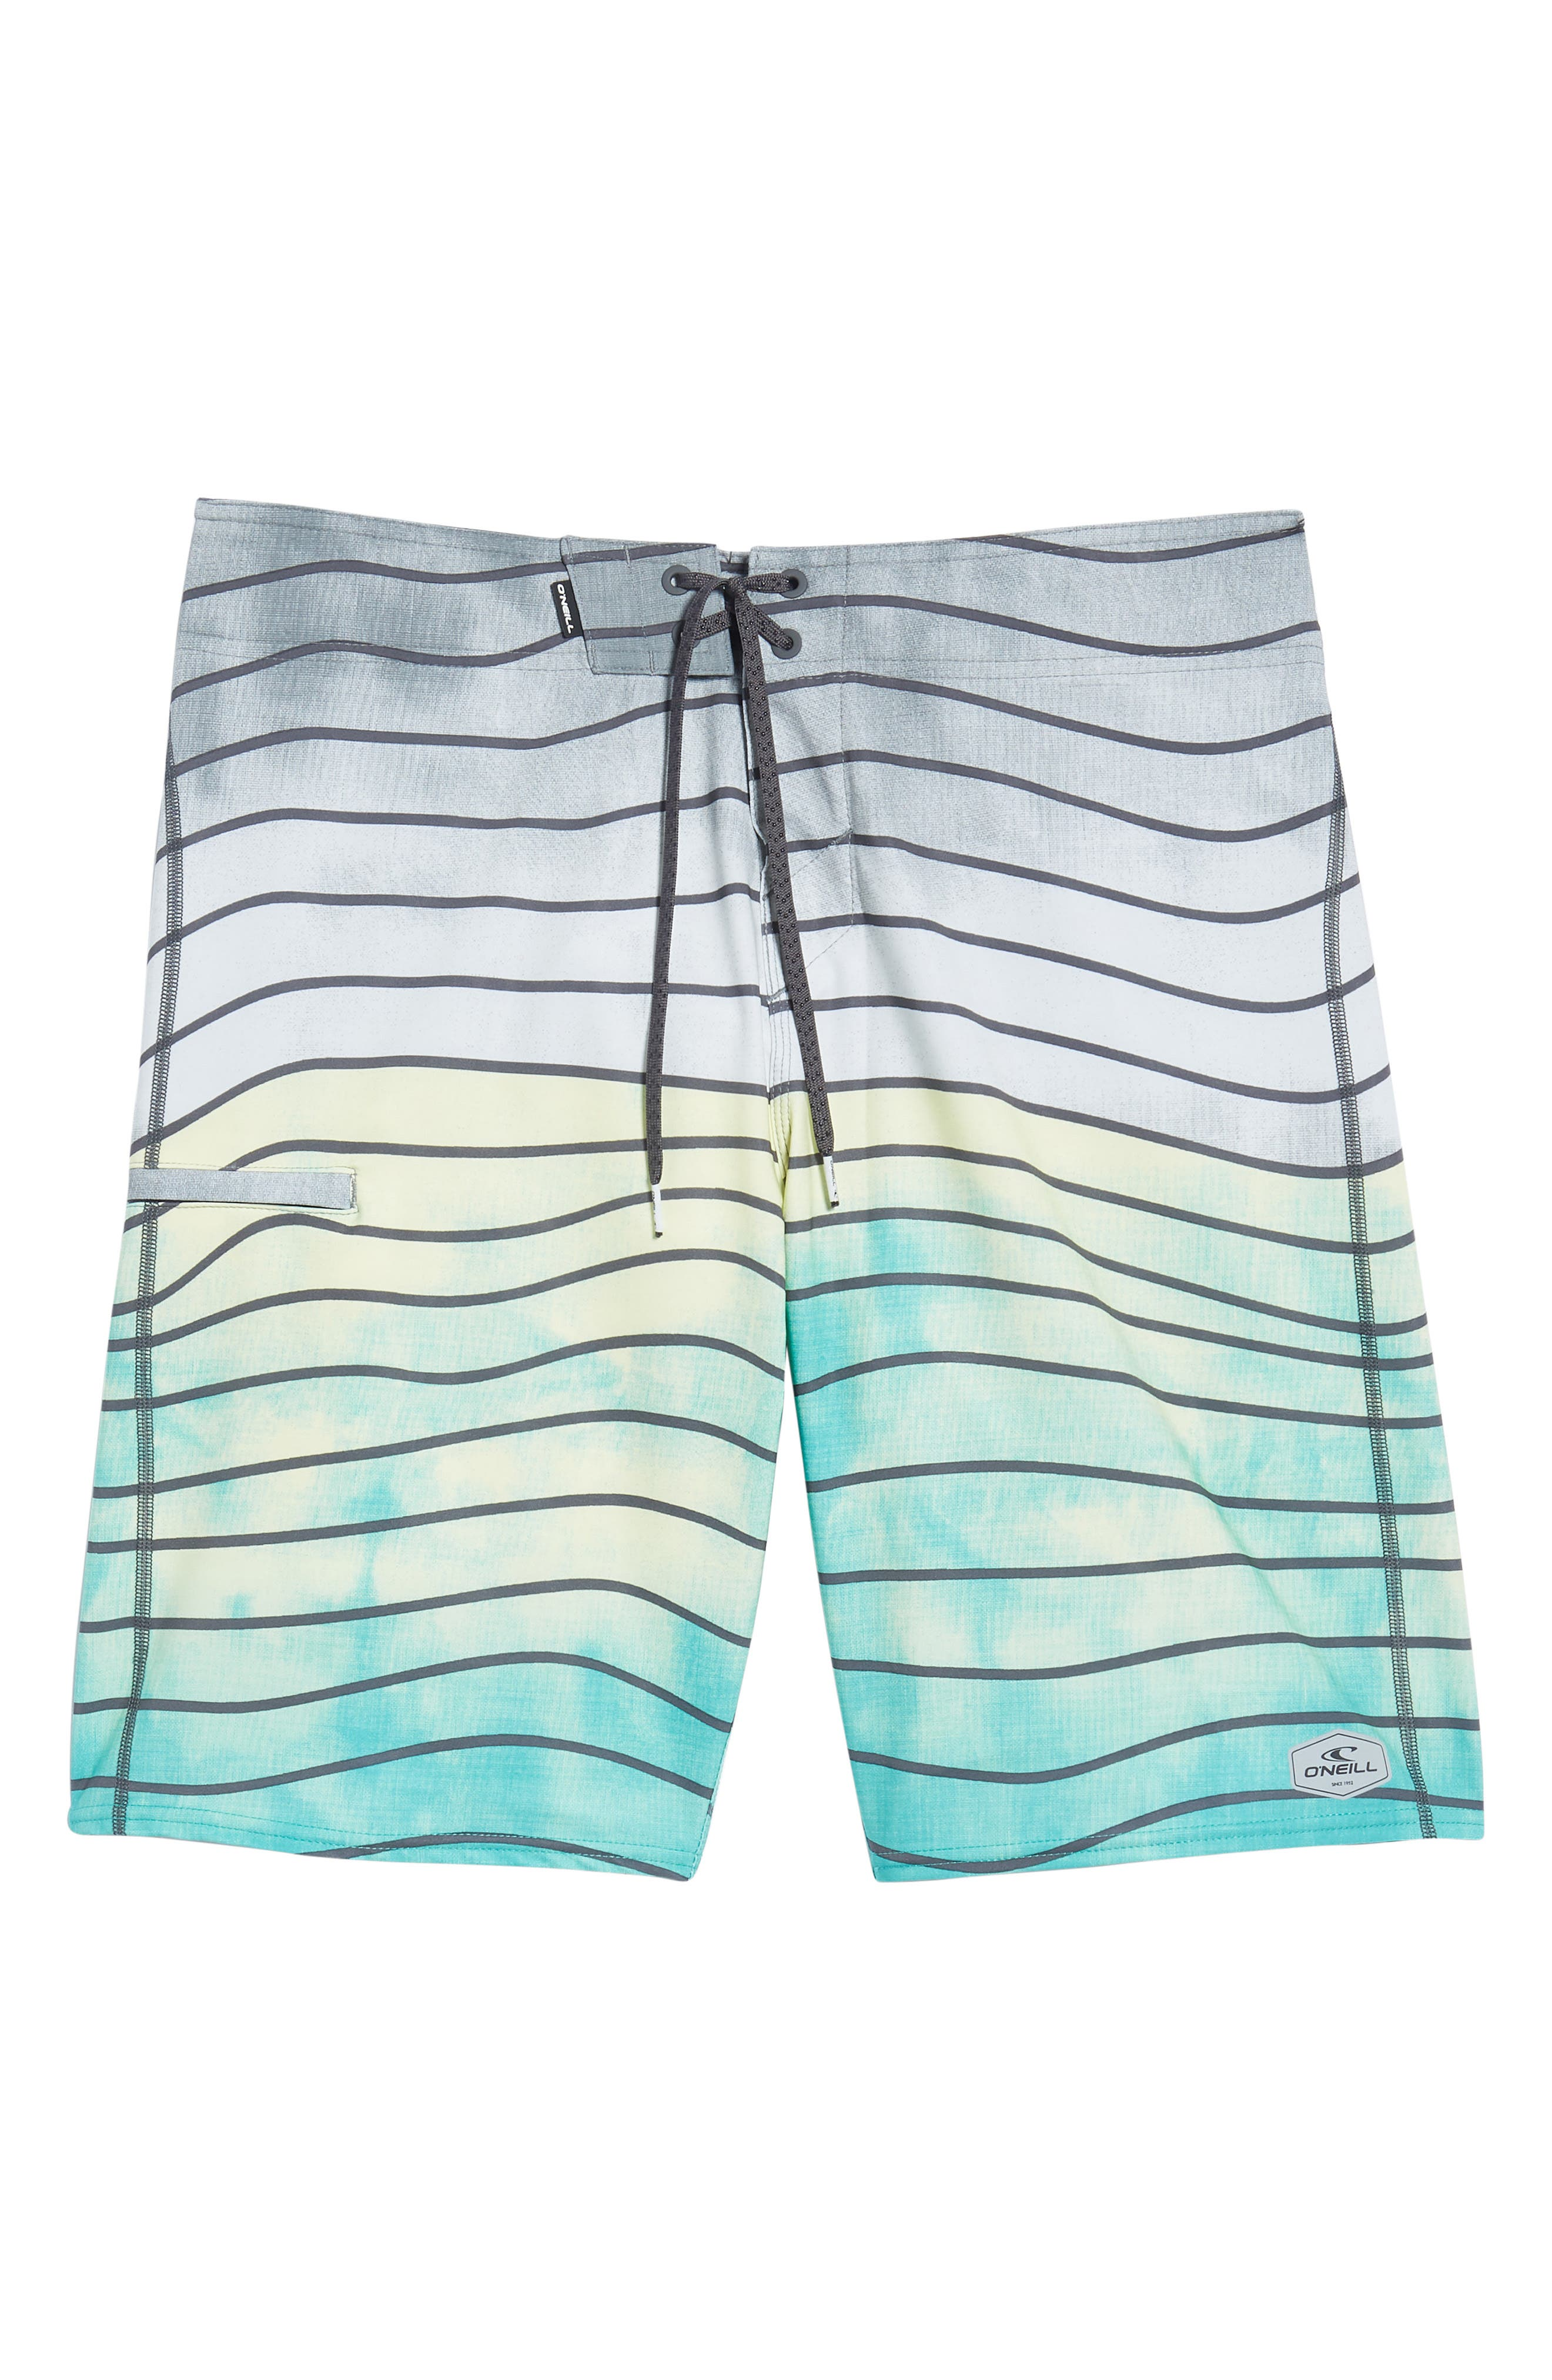 Hyperfreak Swell Board Shorts,                             Alternate thumbnail 6, color,                             Ocean